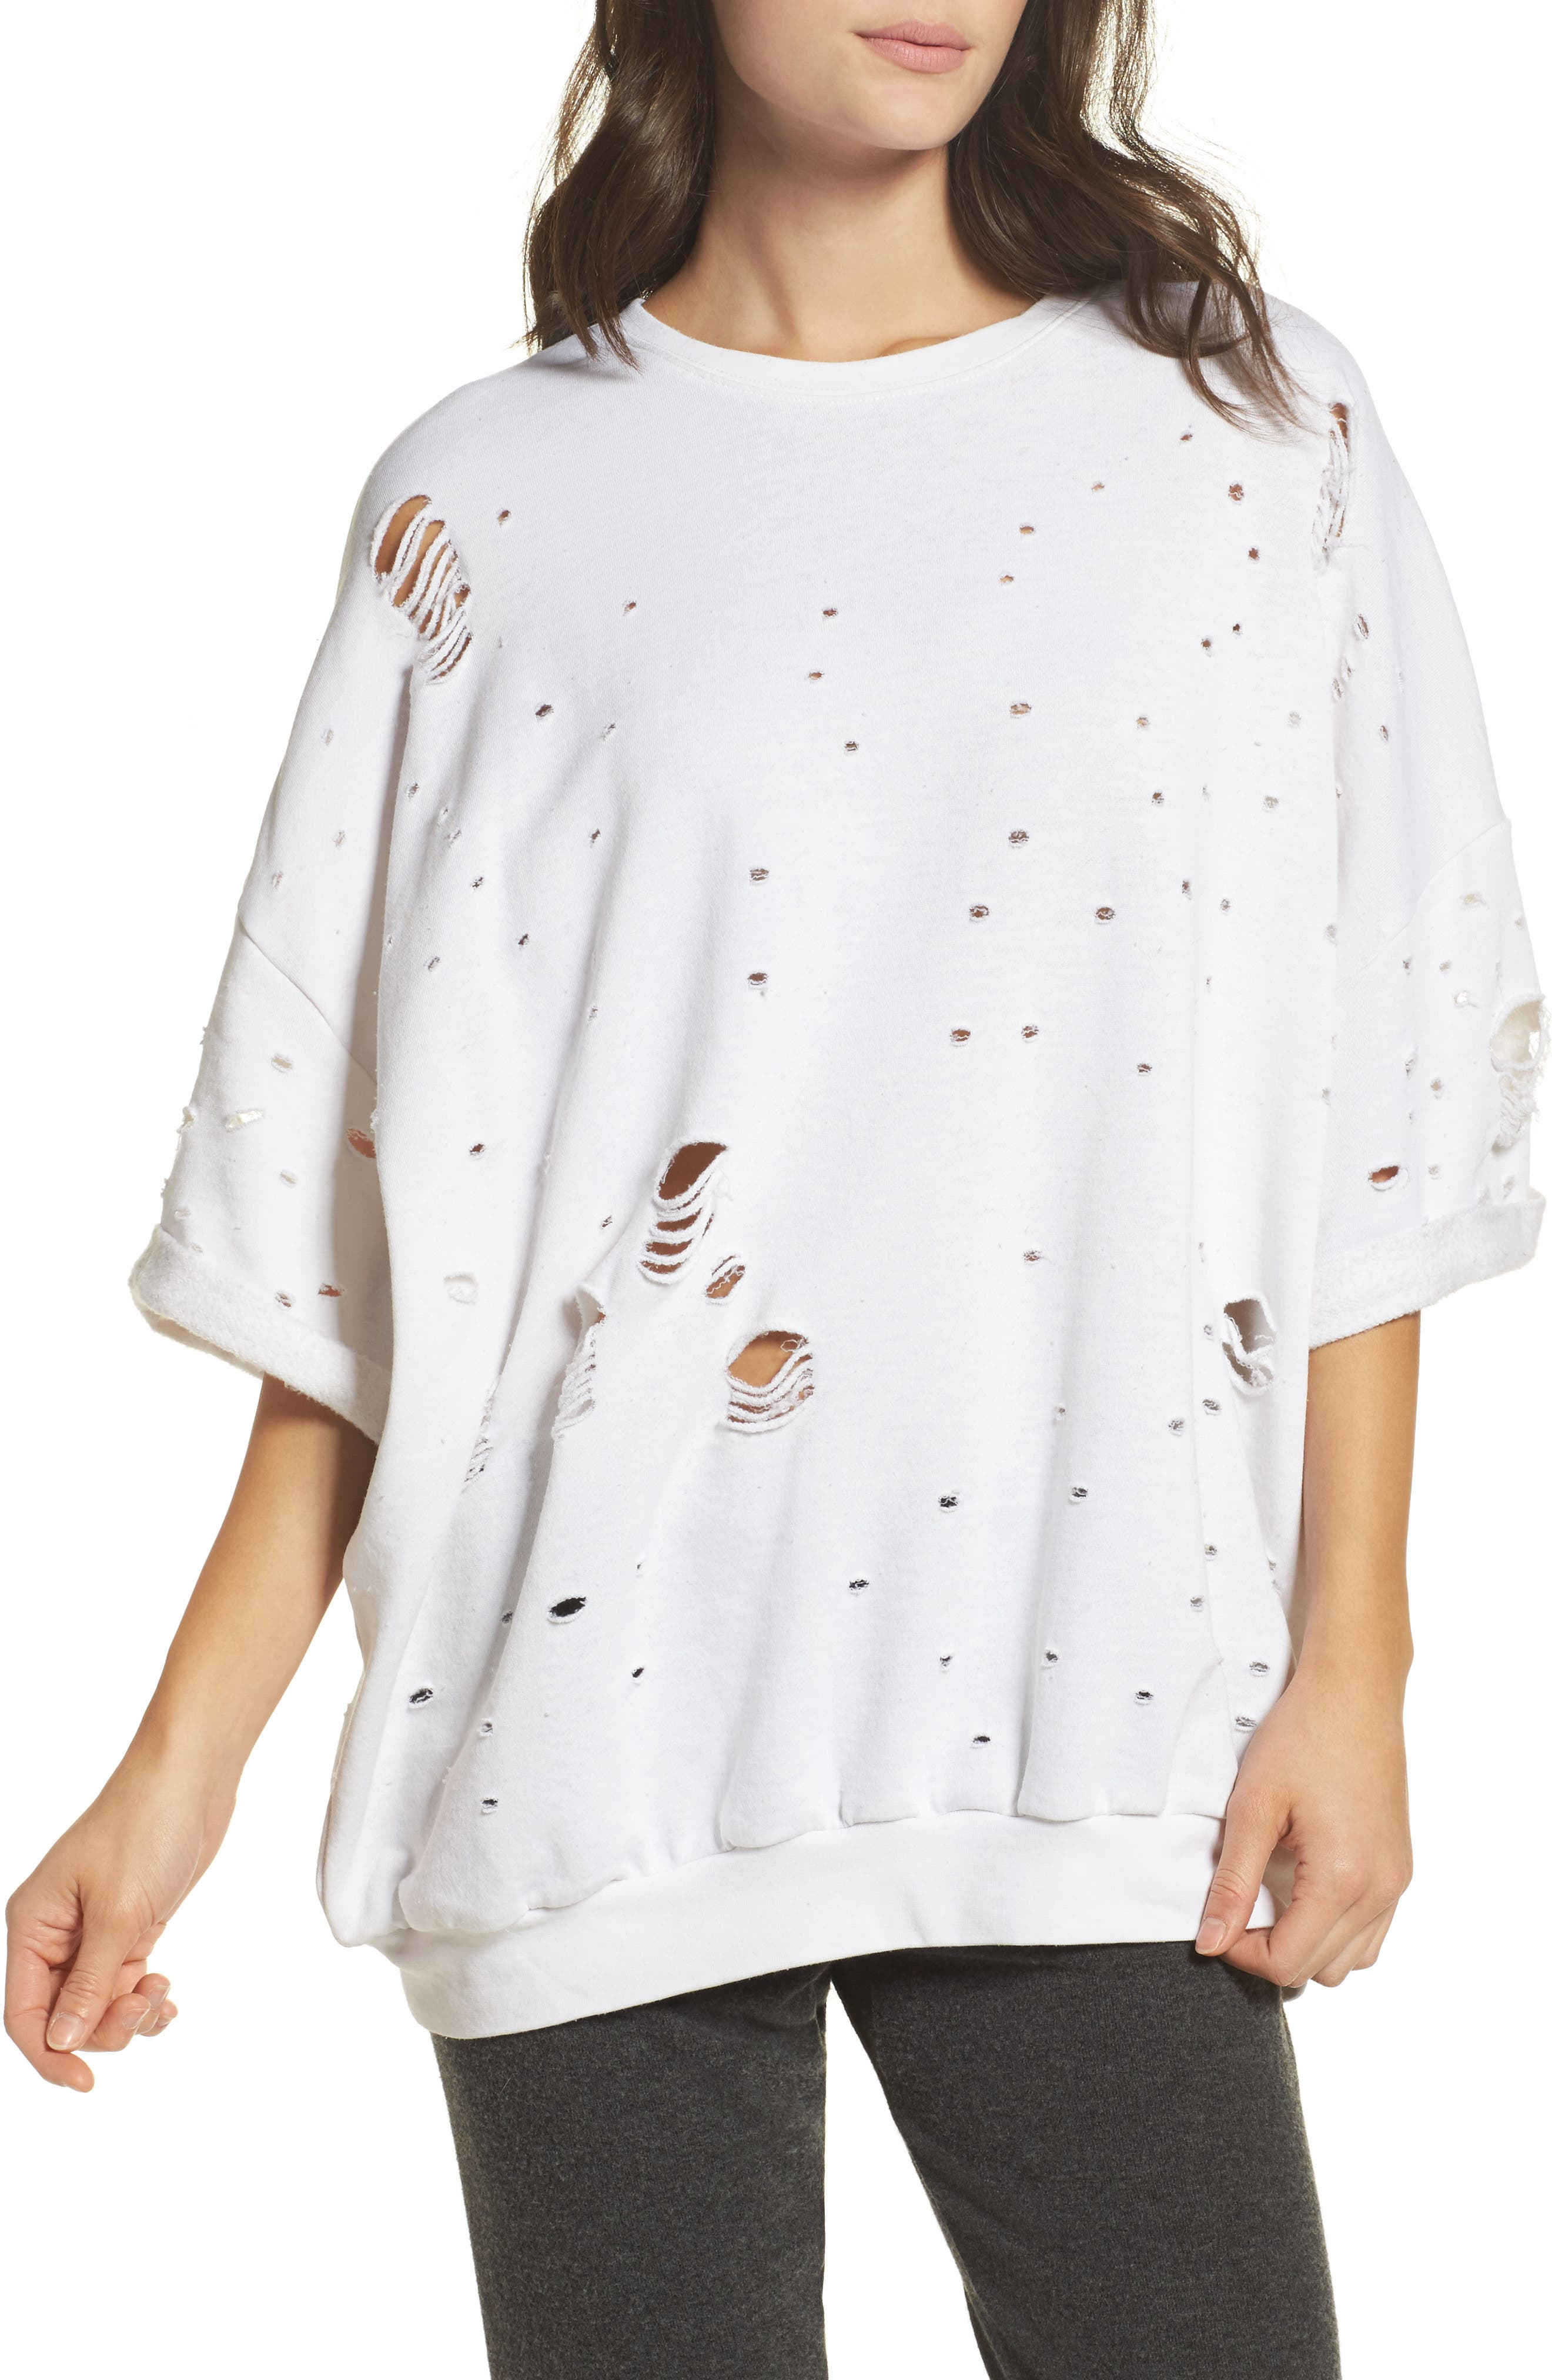 Thrasher Sweatshirt,                         Main,                         color, White